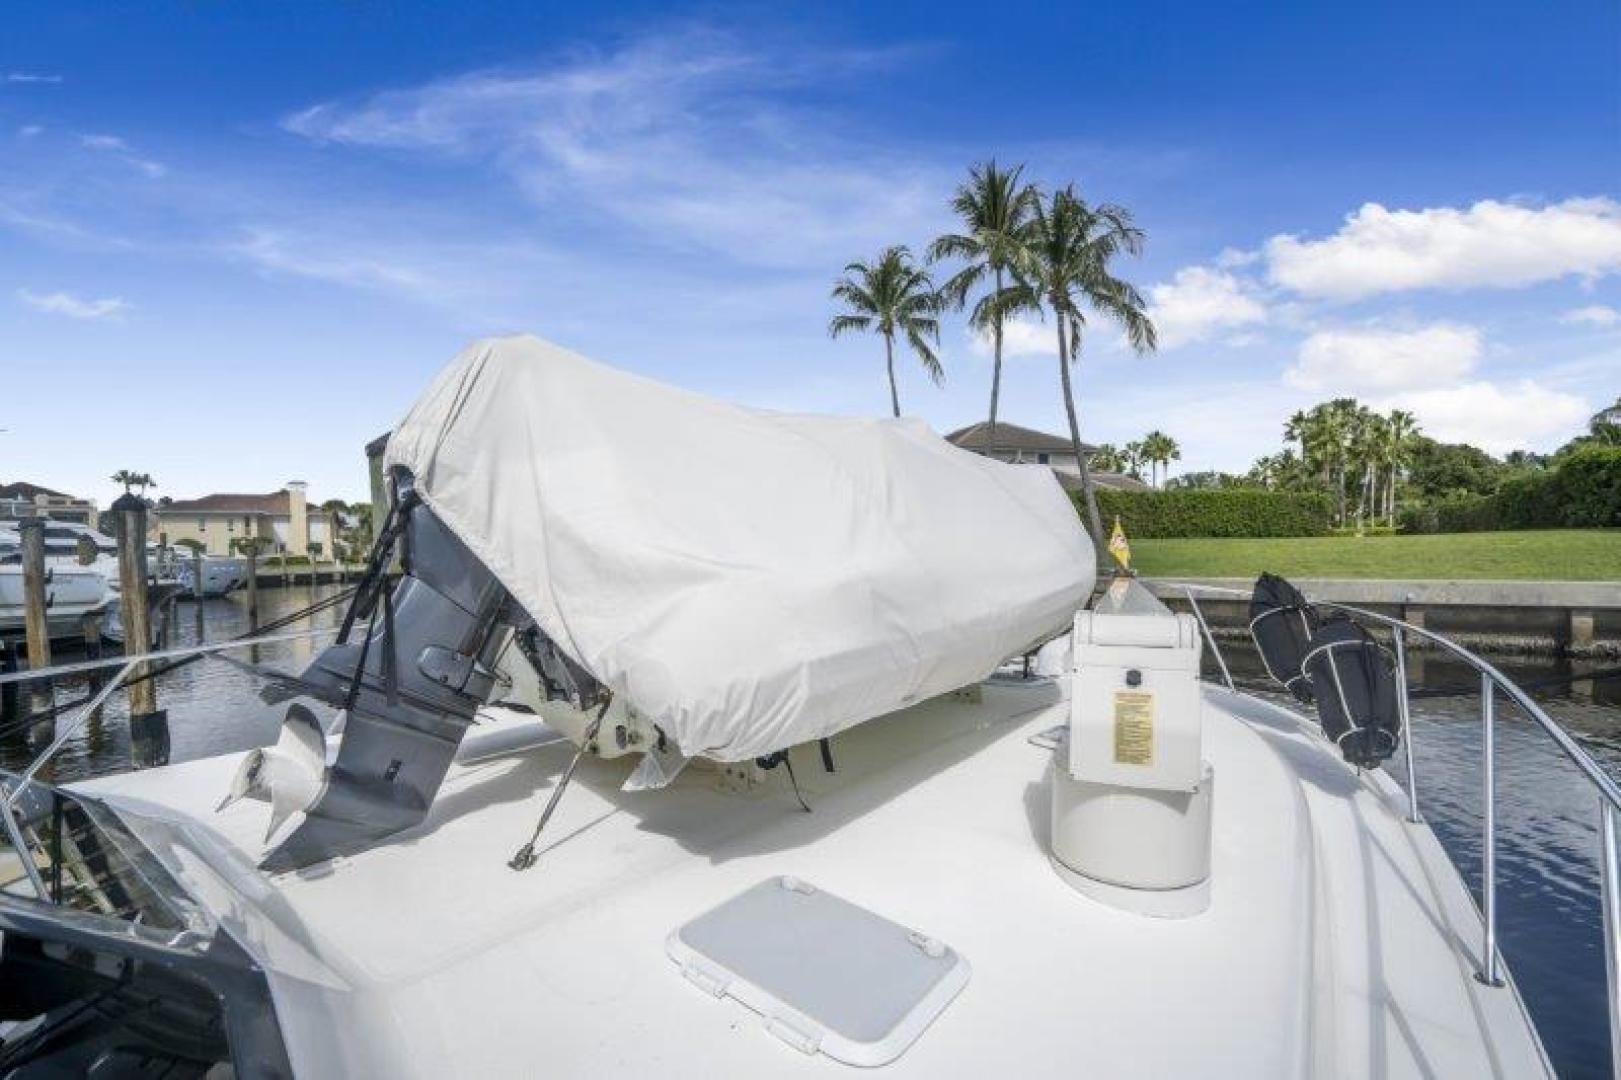 Riviera-Flybridge 2003-SUSAN MARIE North Palm Beach-Florida-United States-Bow-1520674   Thumbnail